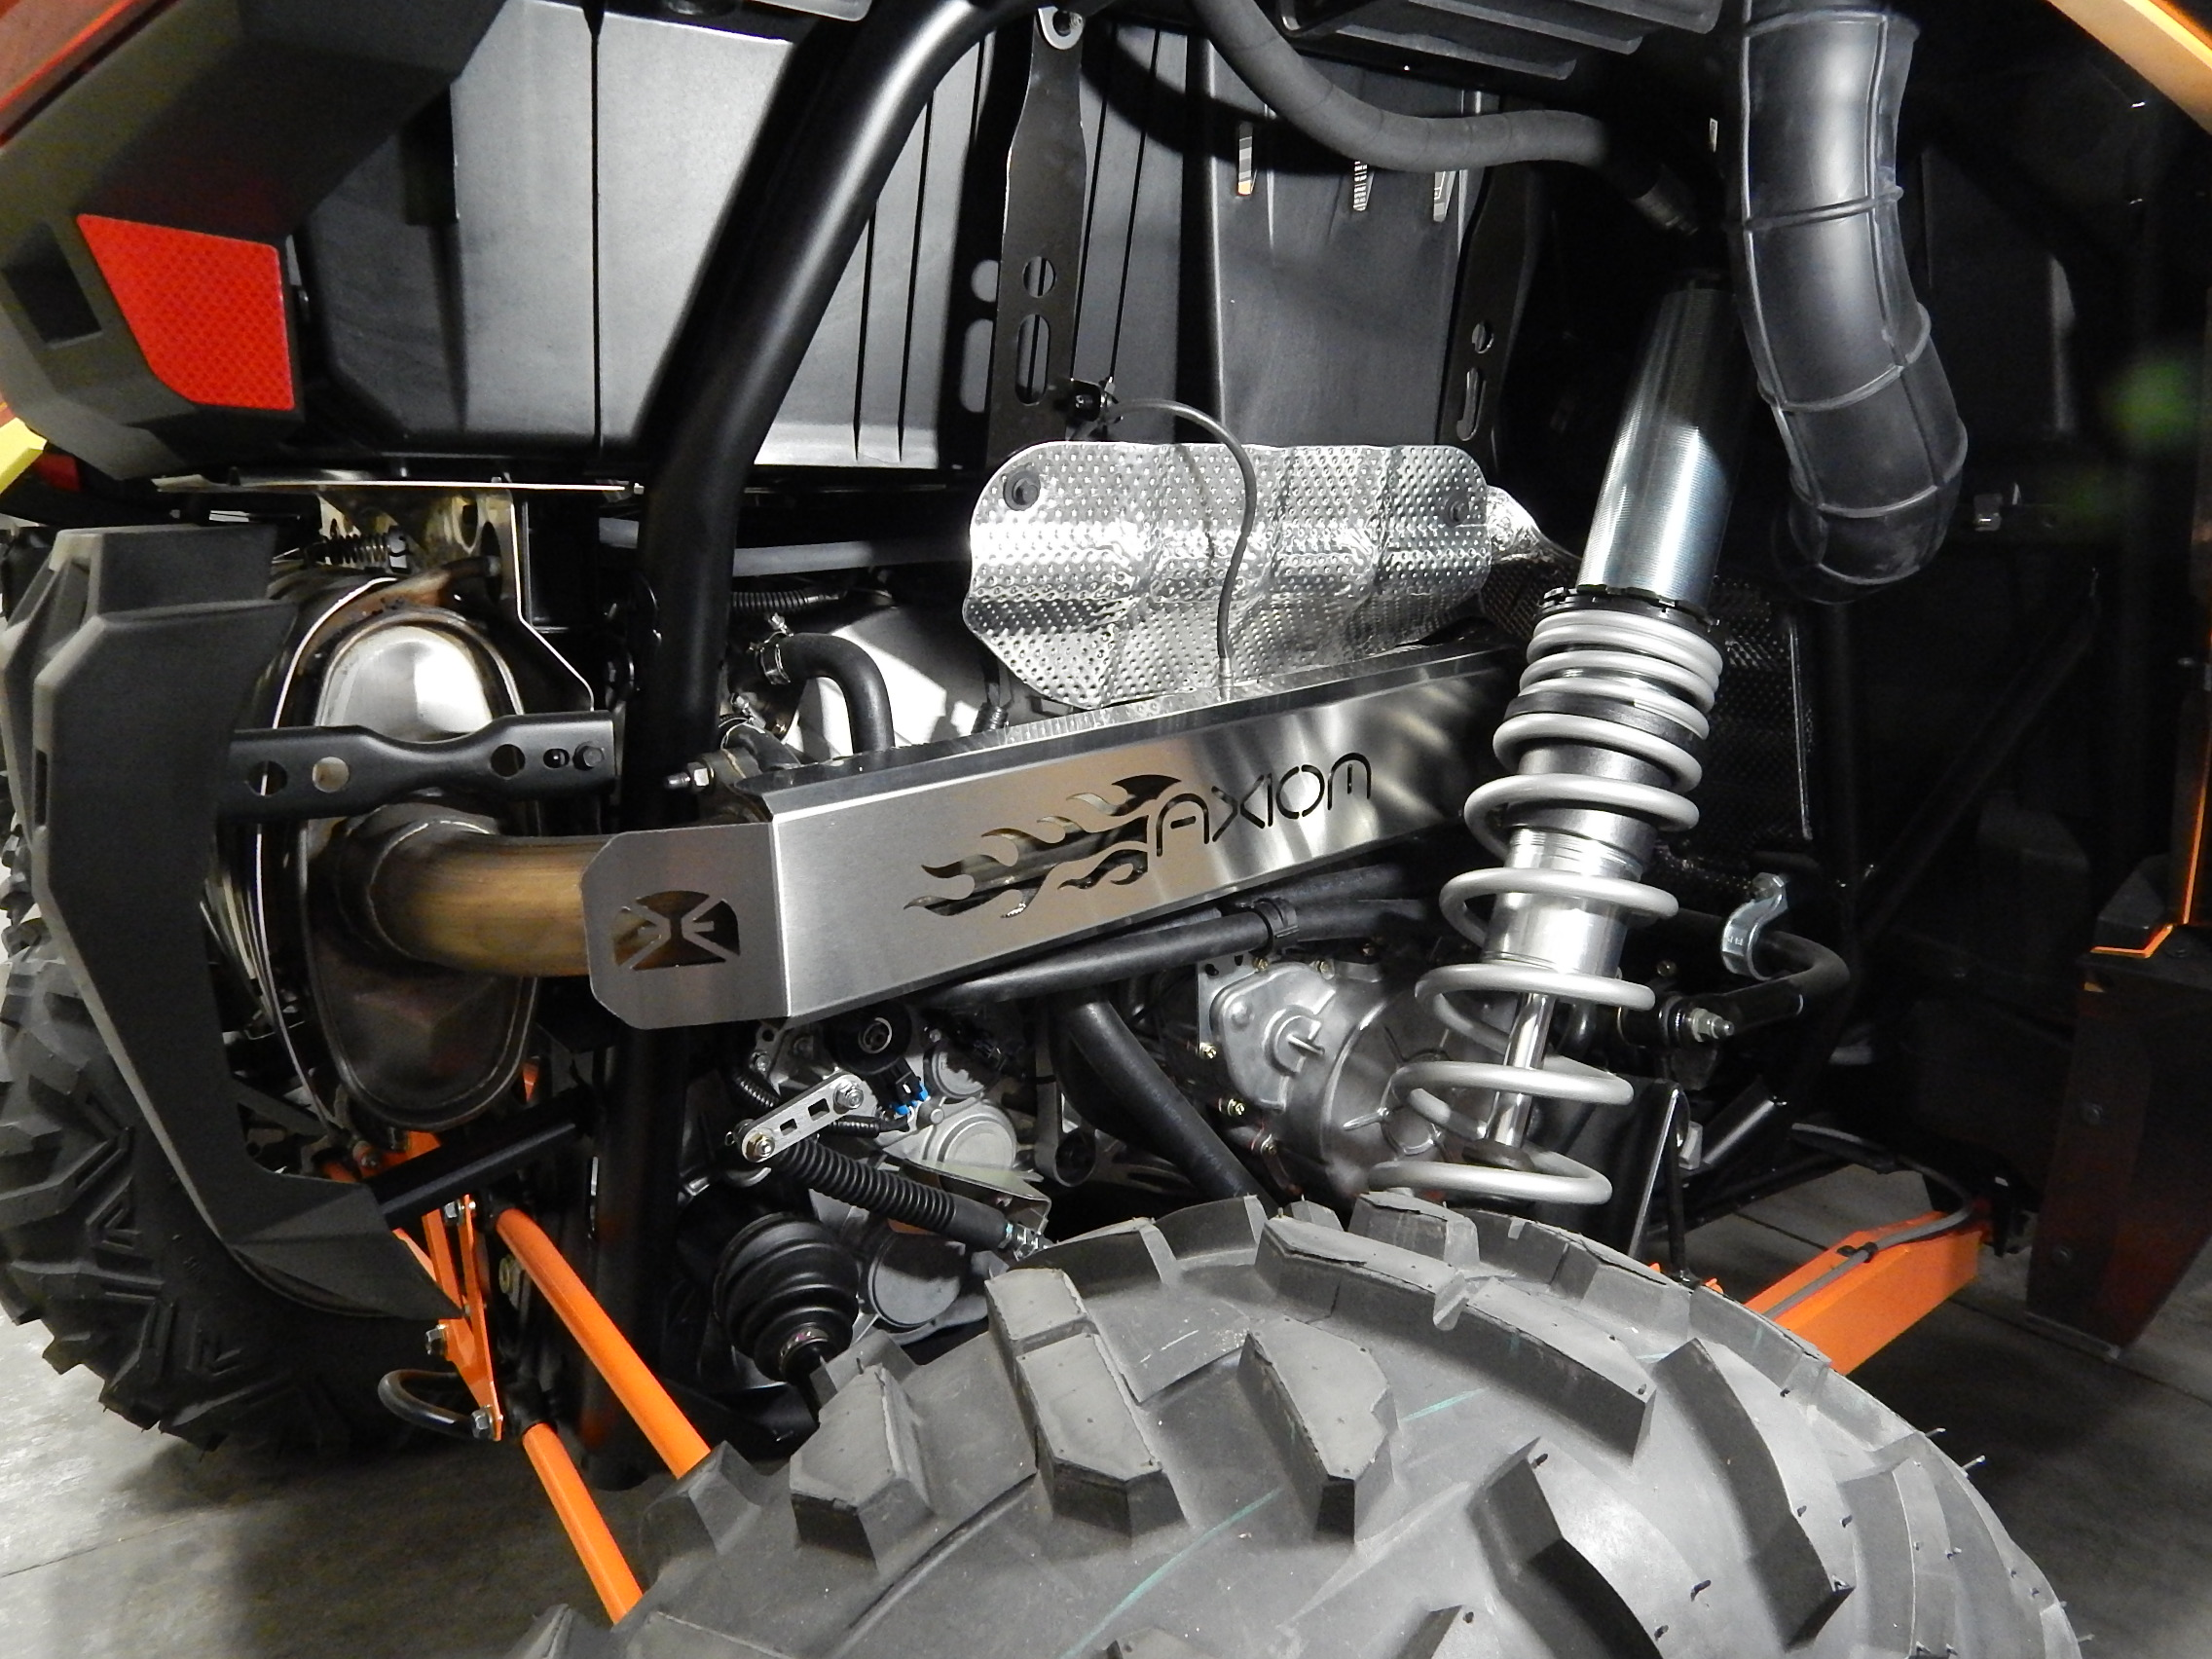 Polaris RZR XP Turbo Exhaust Cover